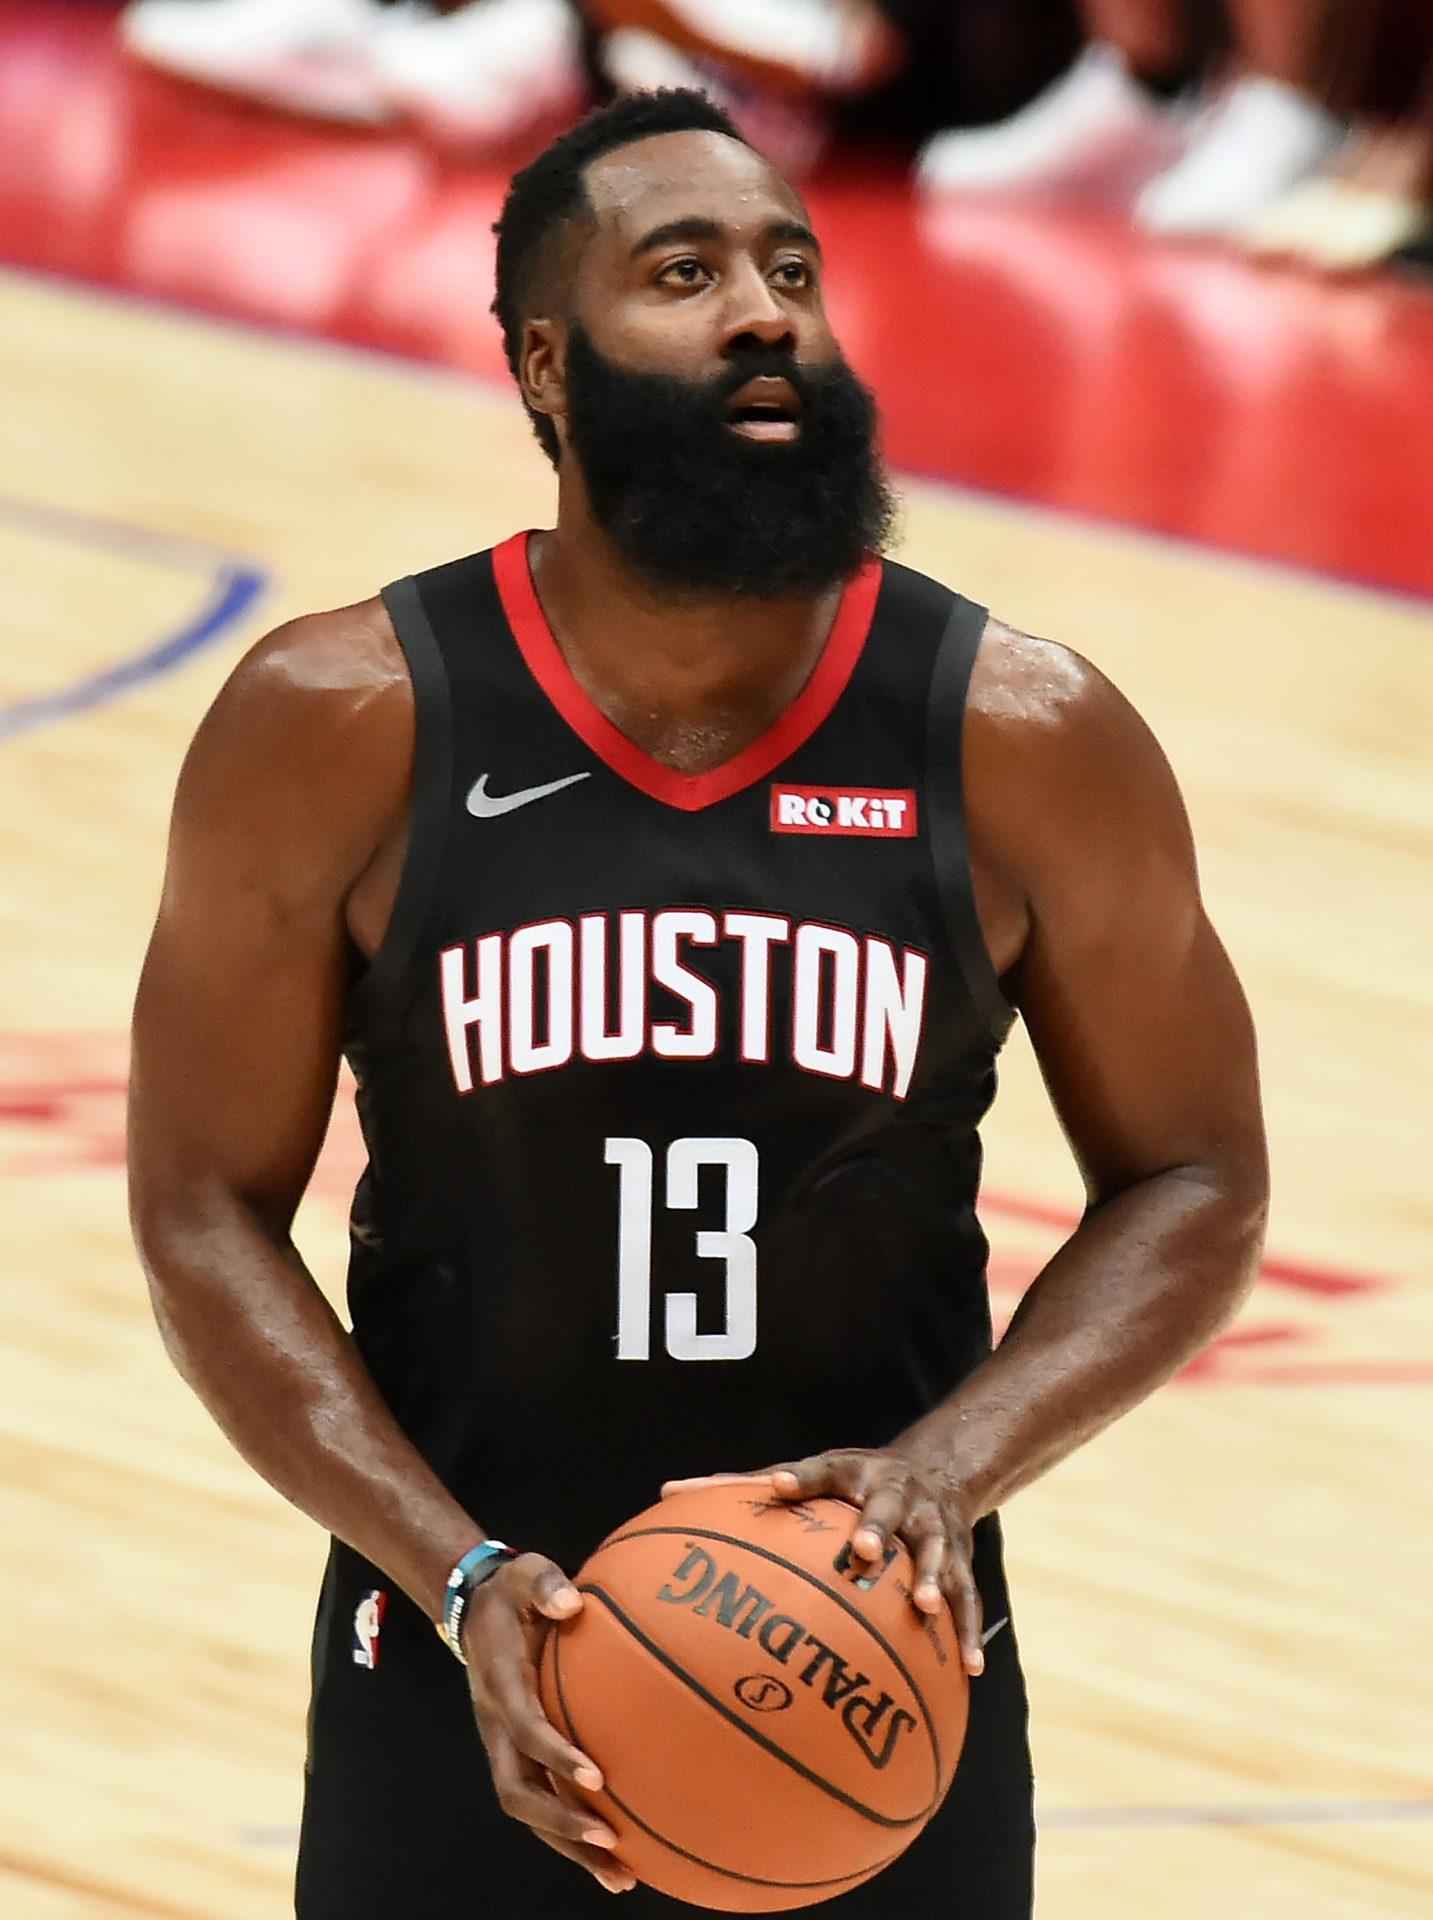 SAITAMA, JAPAN - OCTOBER 08:  James Harden #13 of Houston Rockets shoots the ball against the Toronto Rapters on October 8, 2019 at Saitama Super Arena in Saitama, Japan.  (Photo by Jun Sato/WireImage)